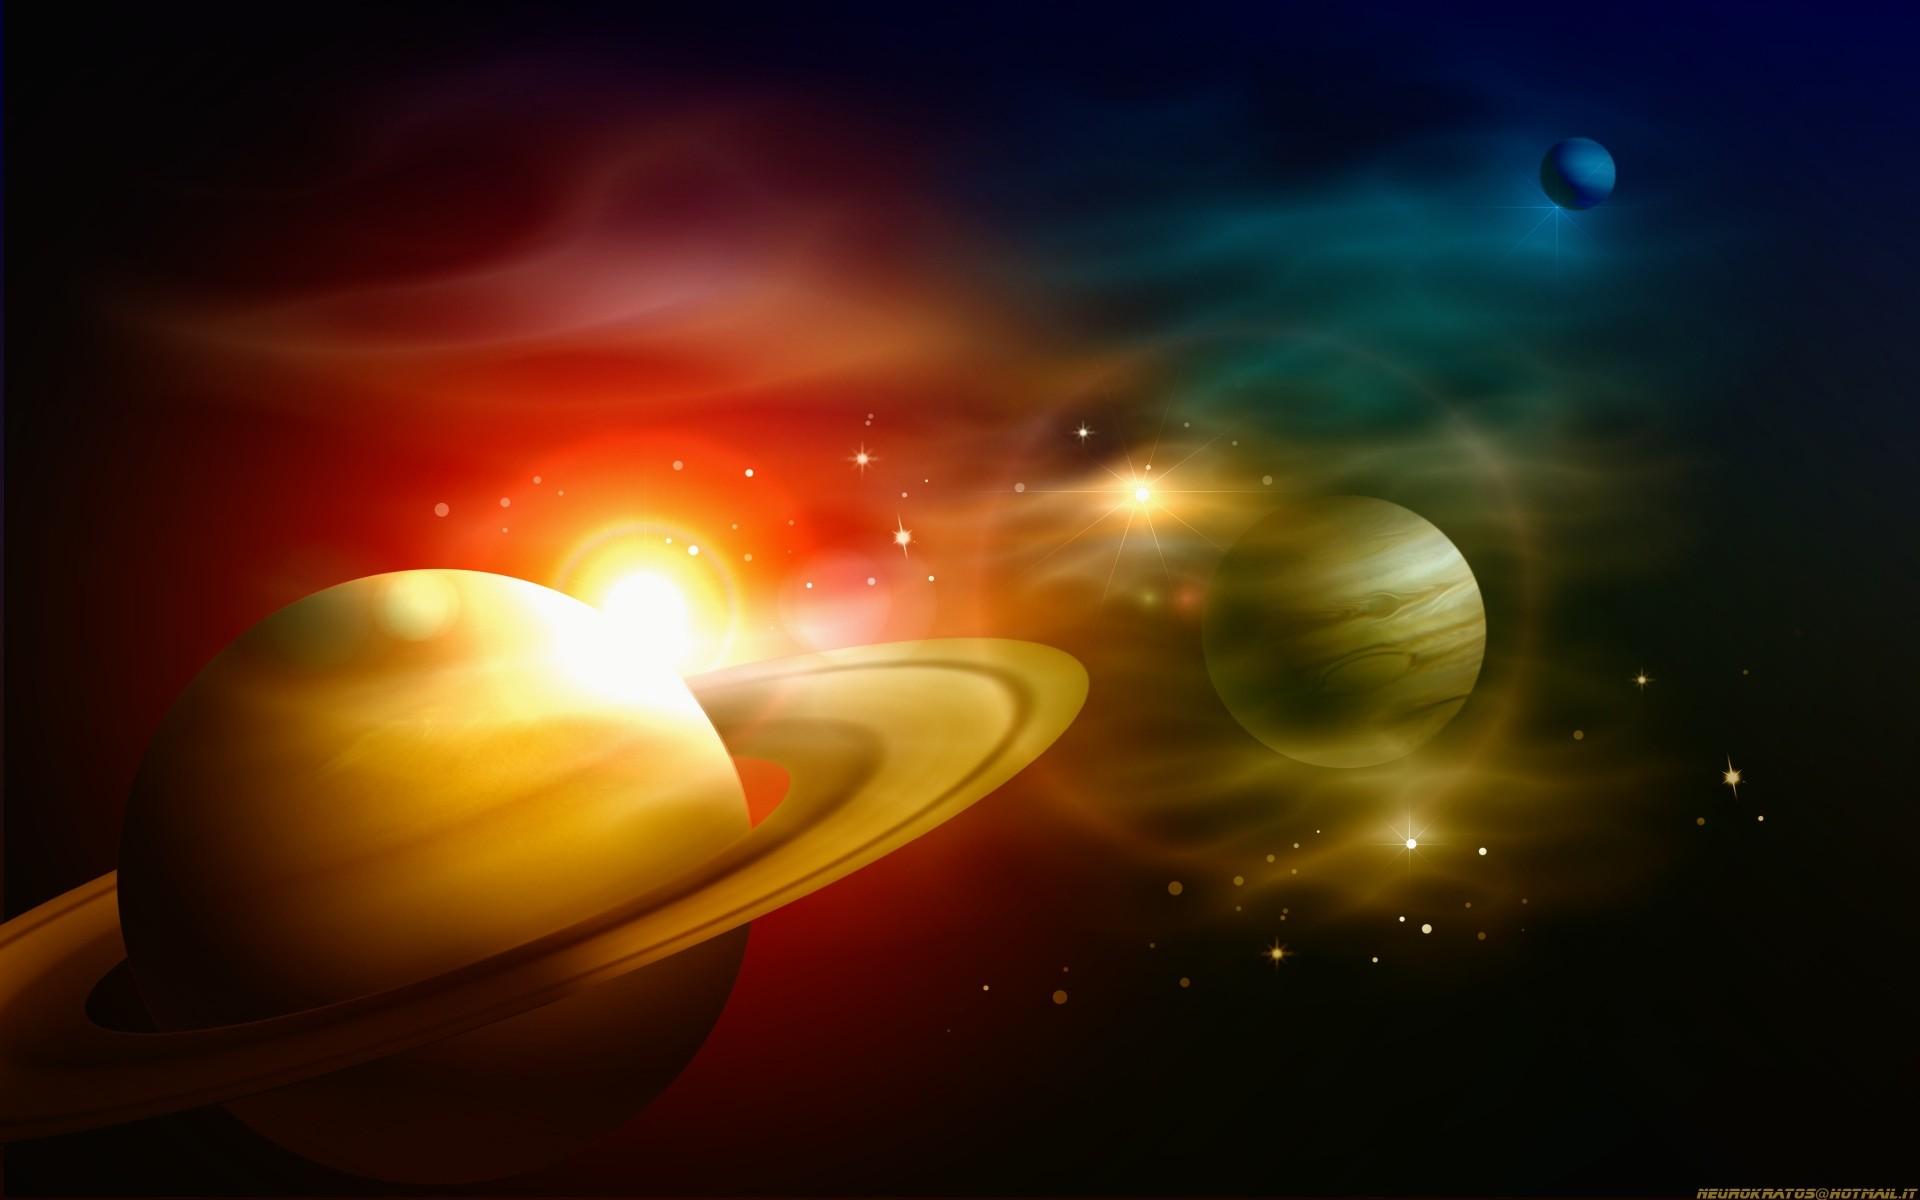 Space Animation Background 2 – YouTube